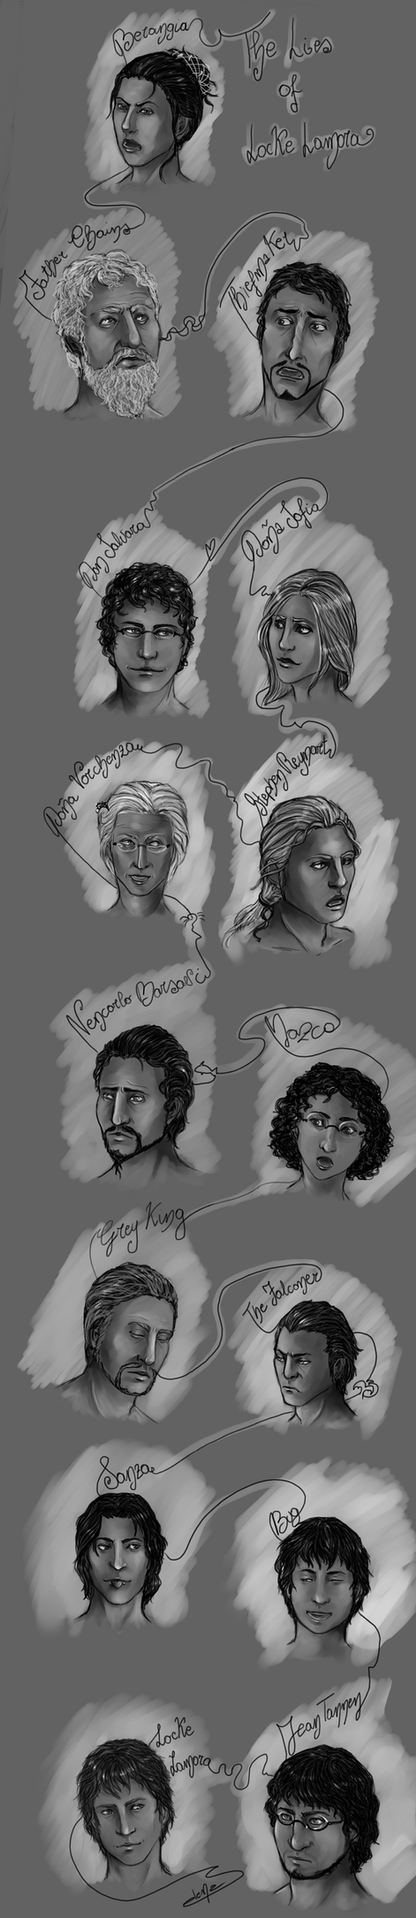 The Lies of Locke Lamora characters by Haekate